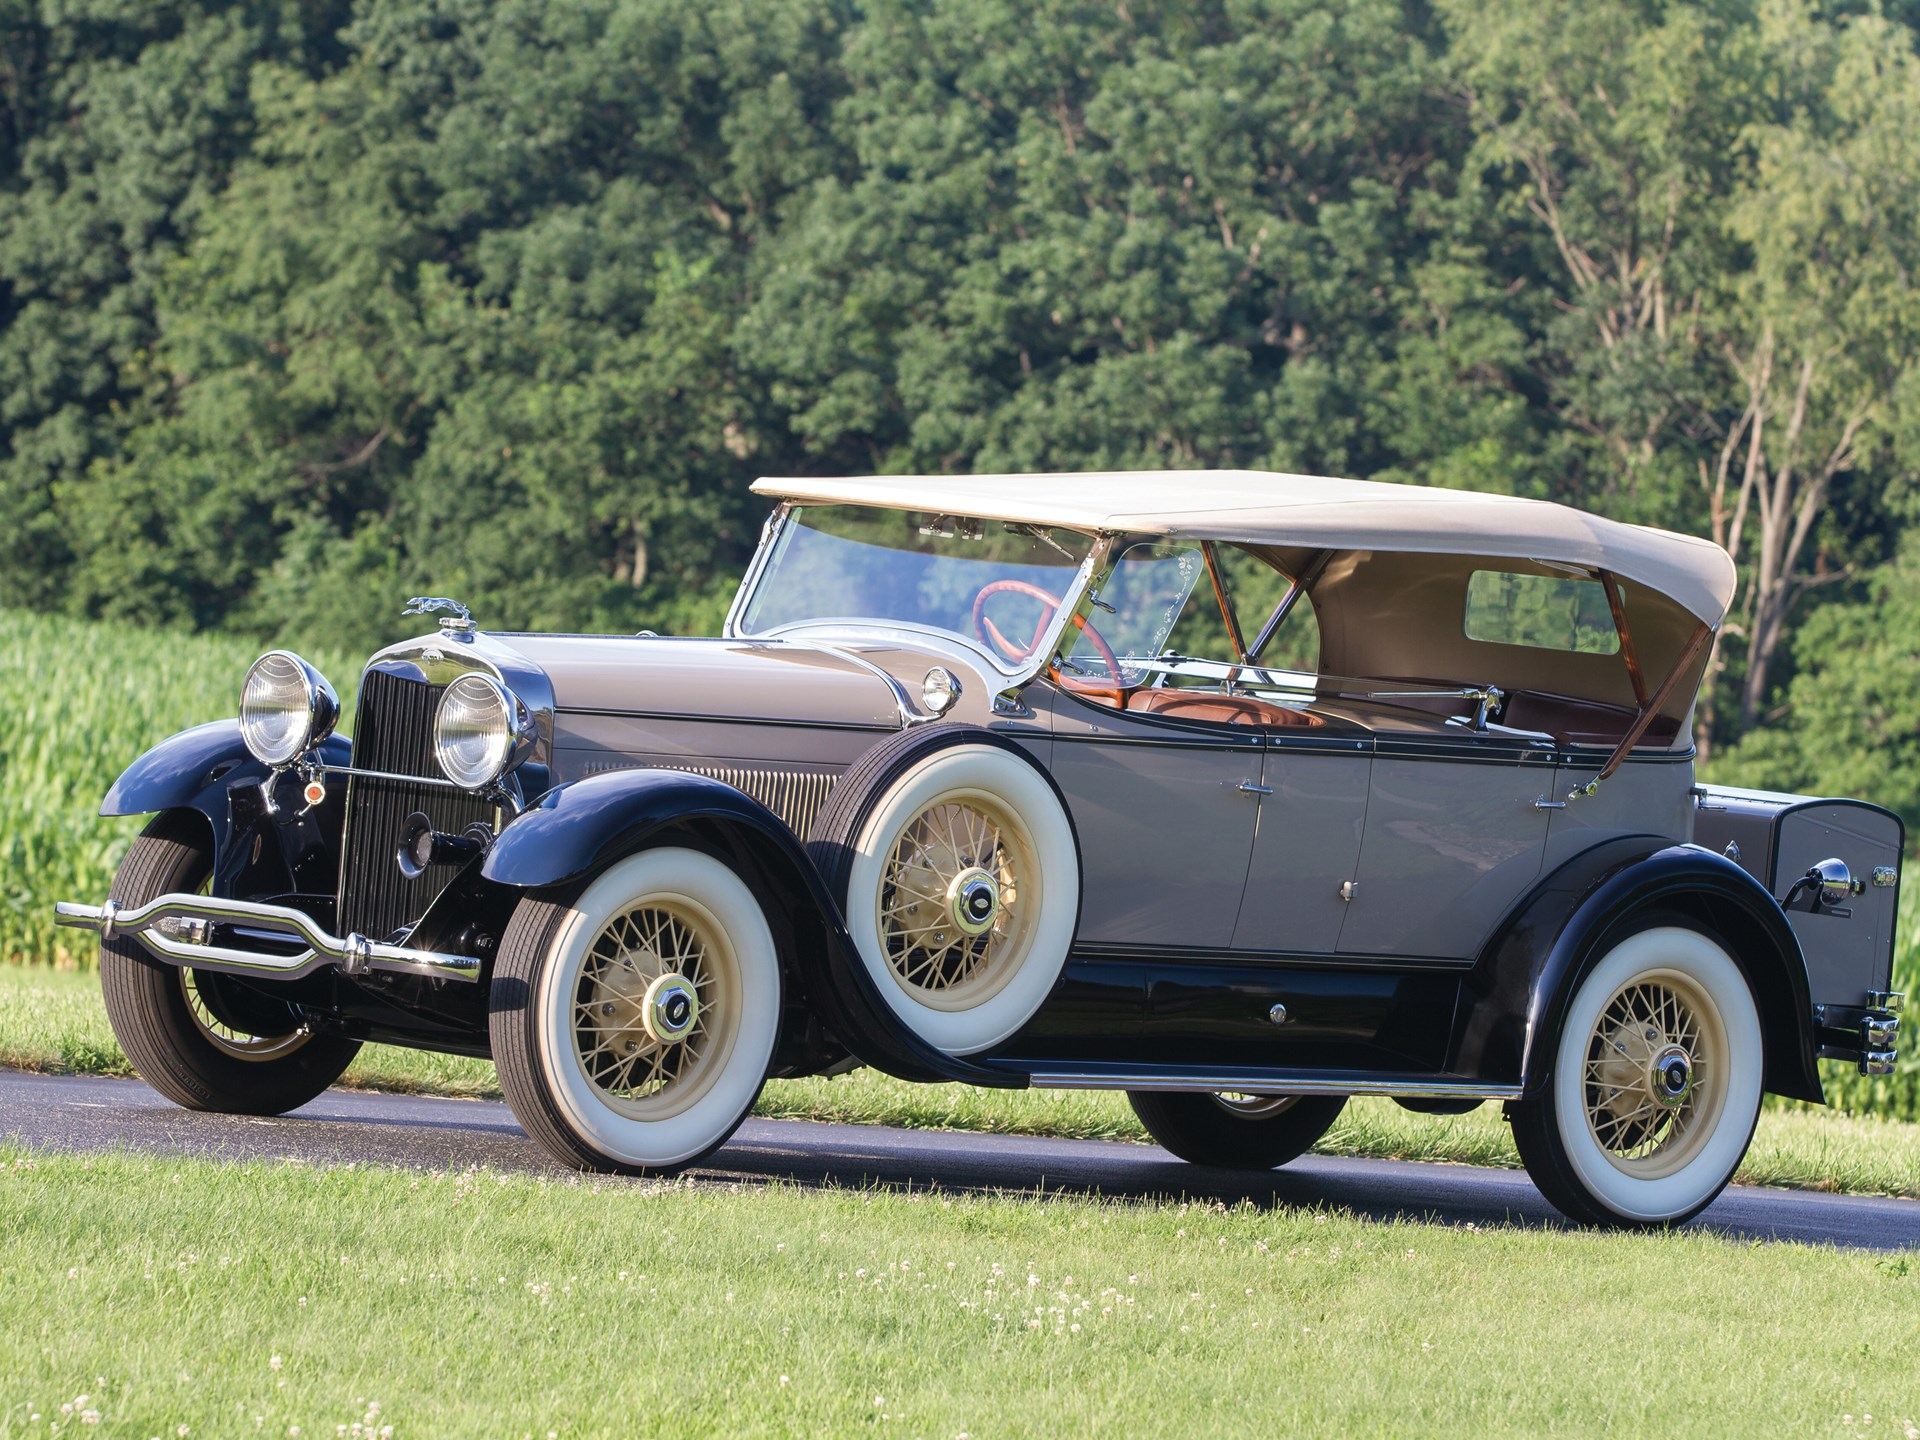 1929 Lincoln Model L engine